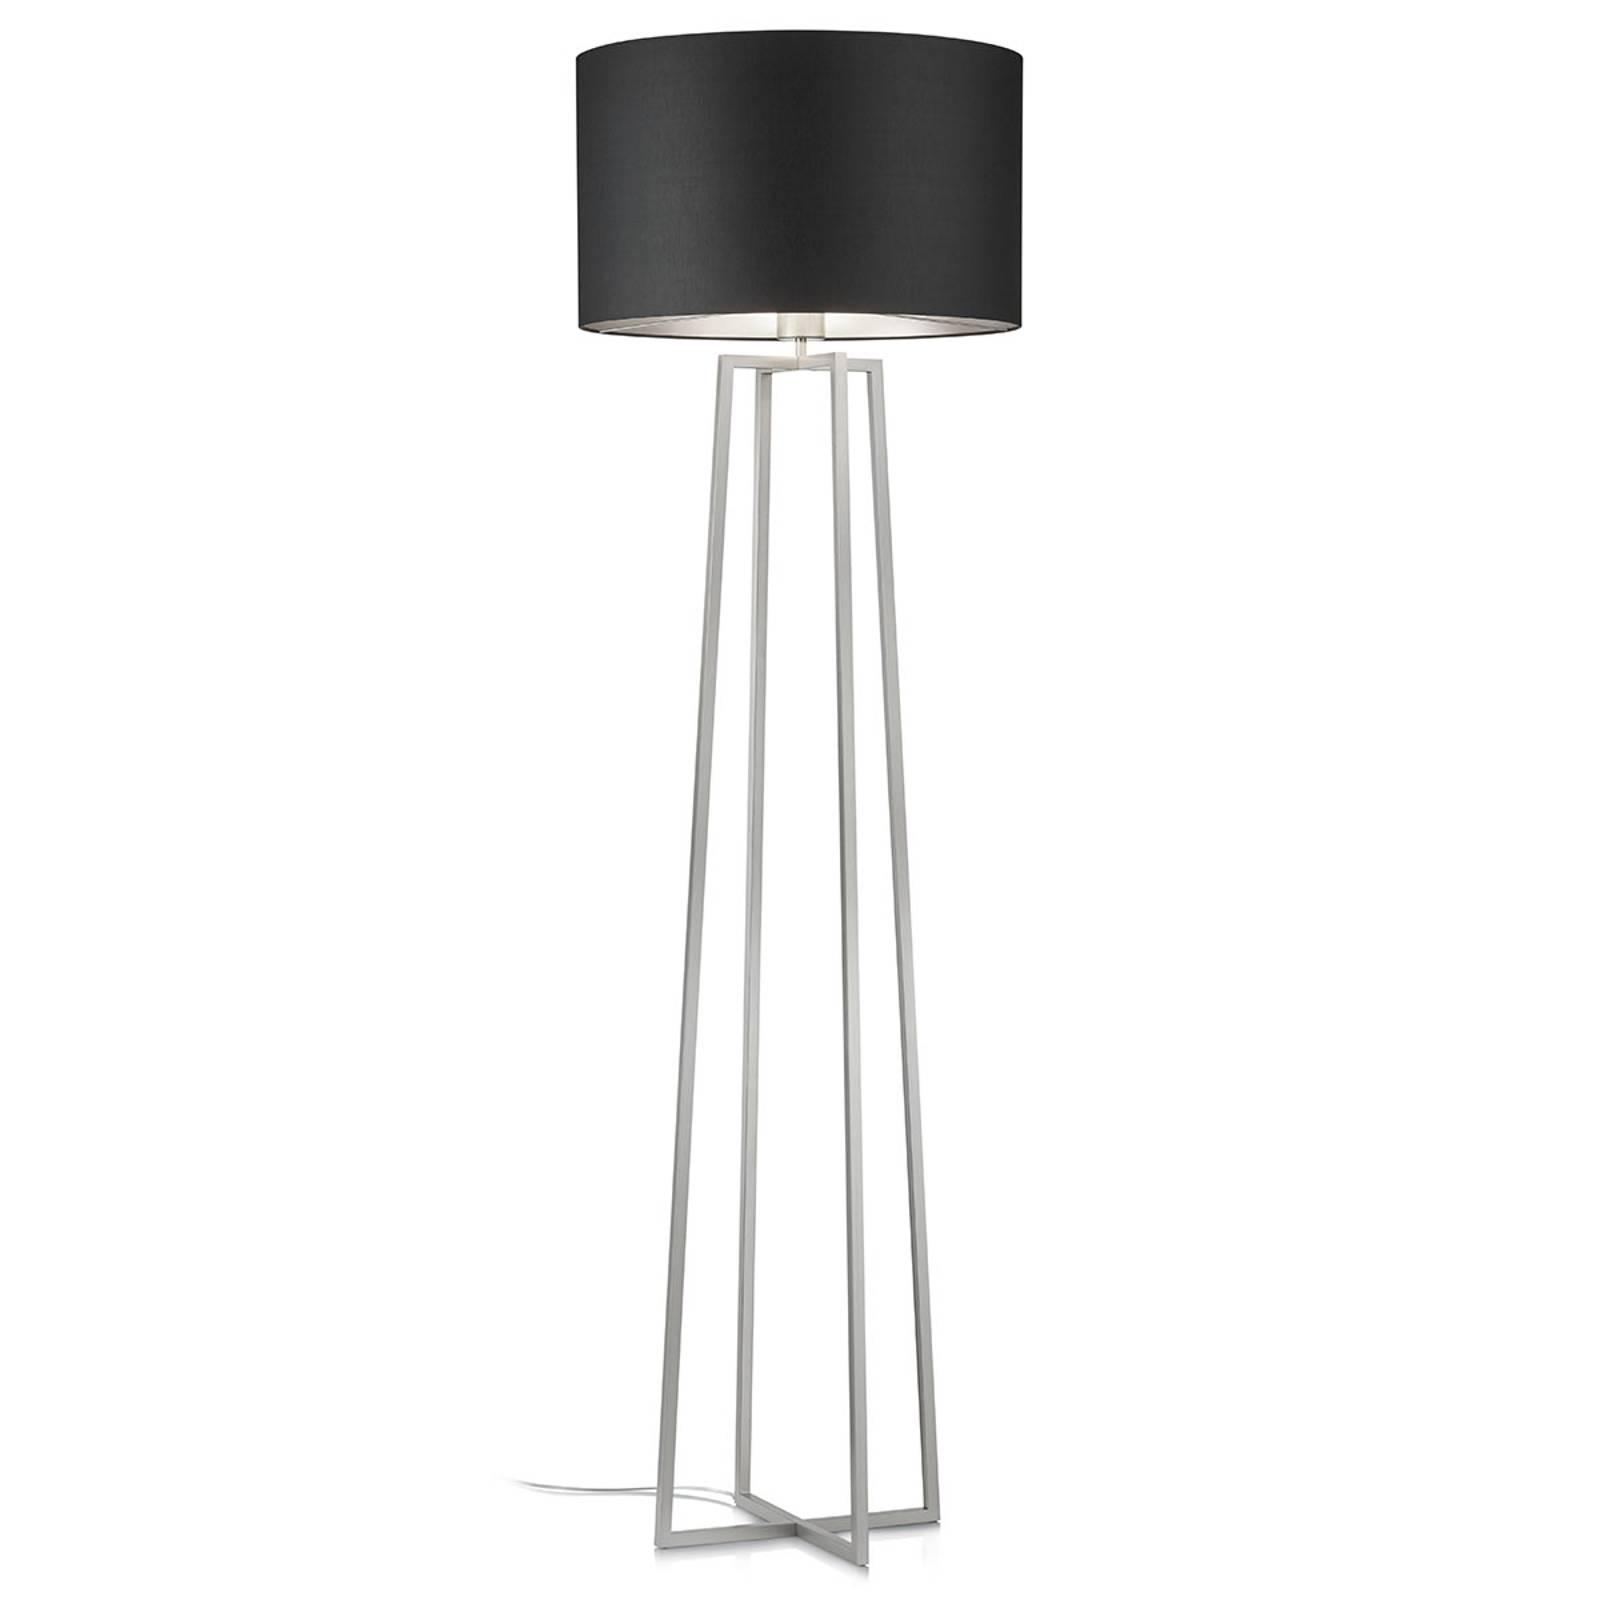 Dimmbare Stehlampe Hermes mit edlem Chintz-Schirm